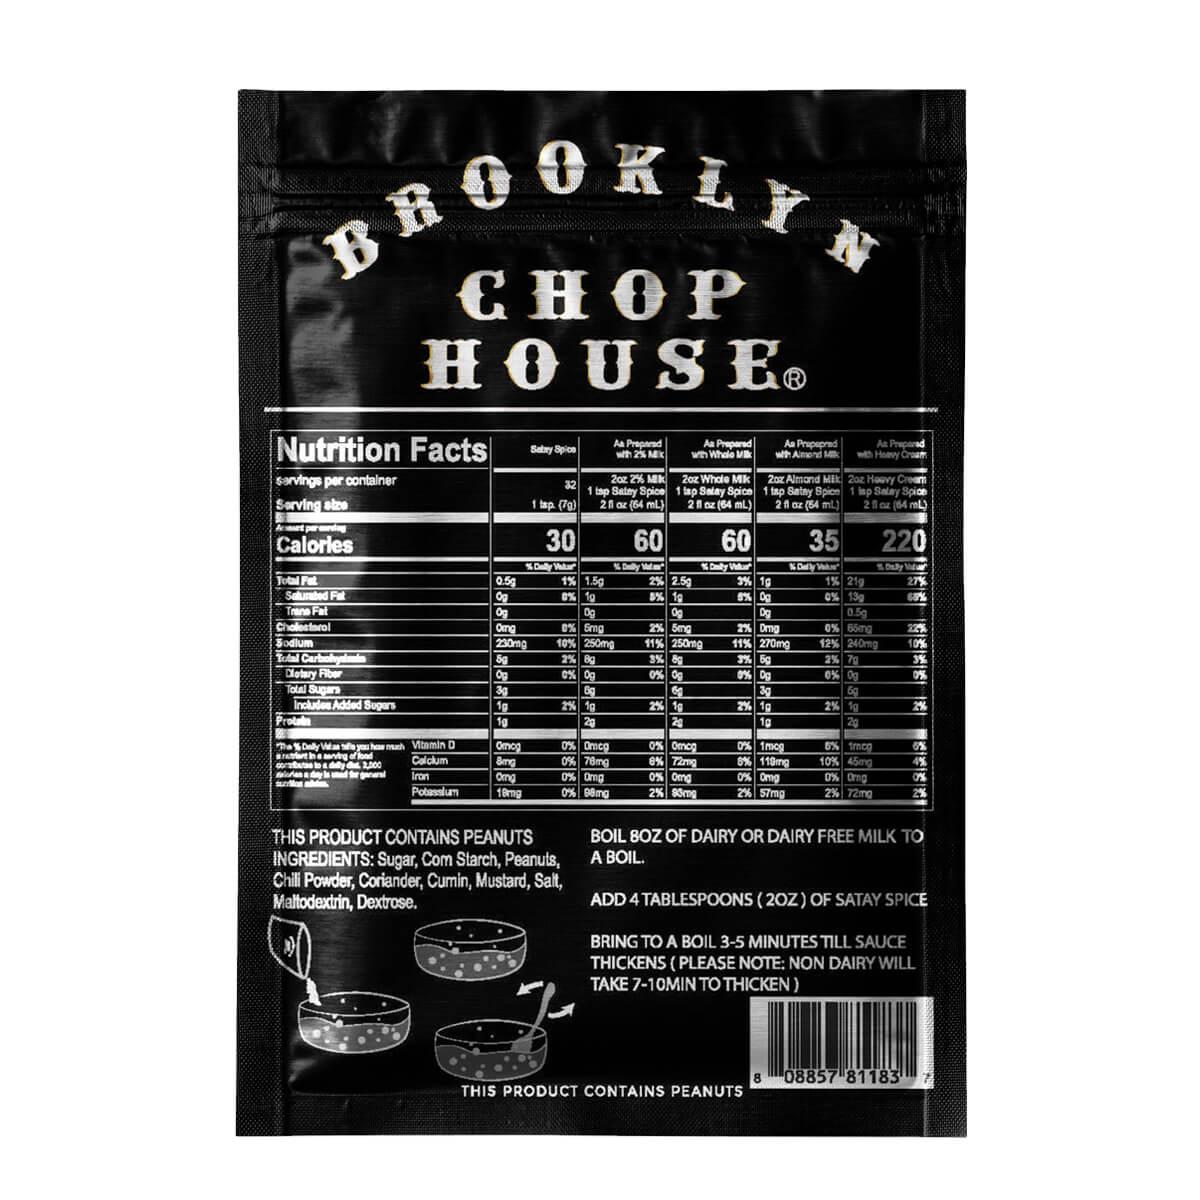 Brooklyn Chop House Satay Sauce, back of pack, 8oz, nutrition panel